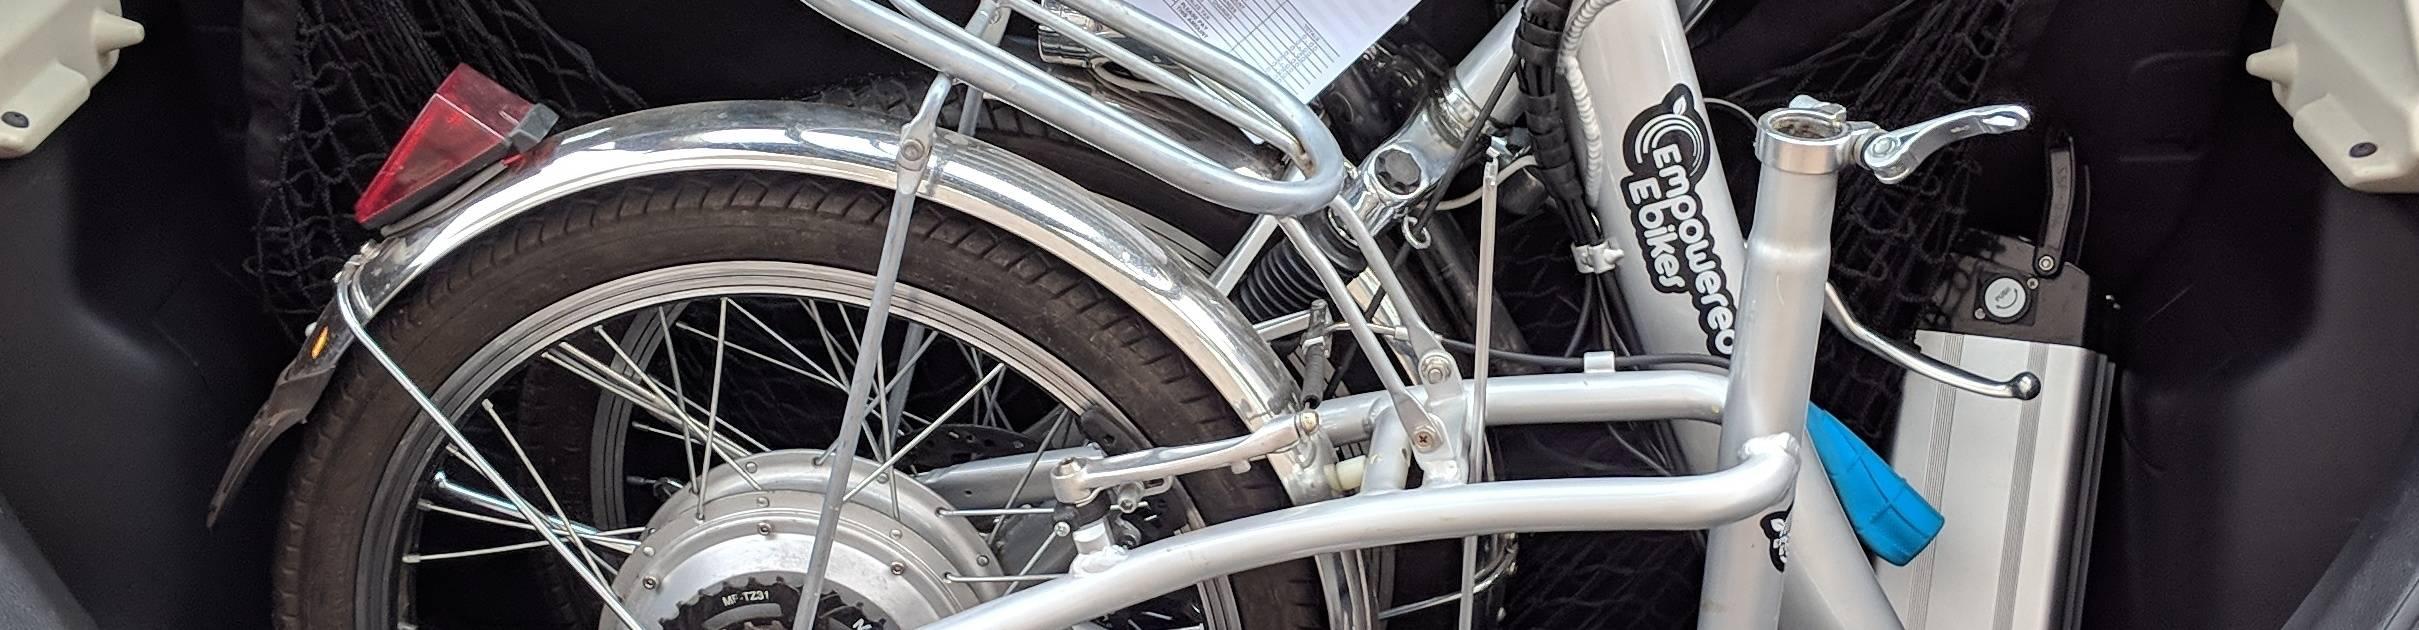 virmuze exhibit Folding Bikes logo main banner